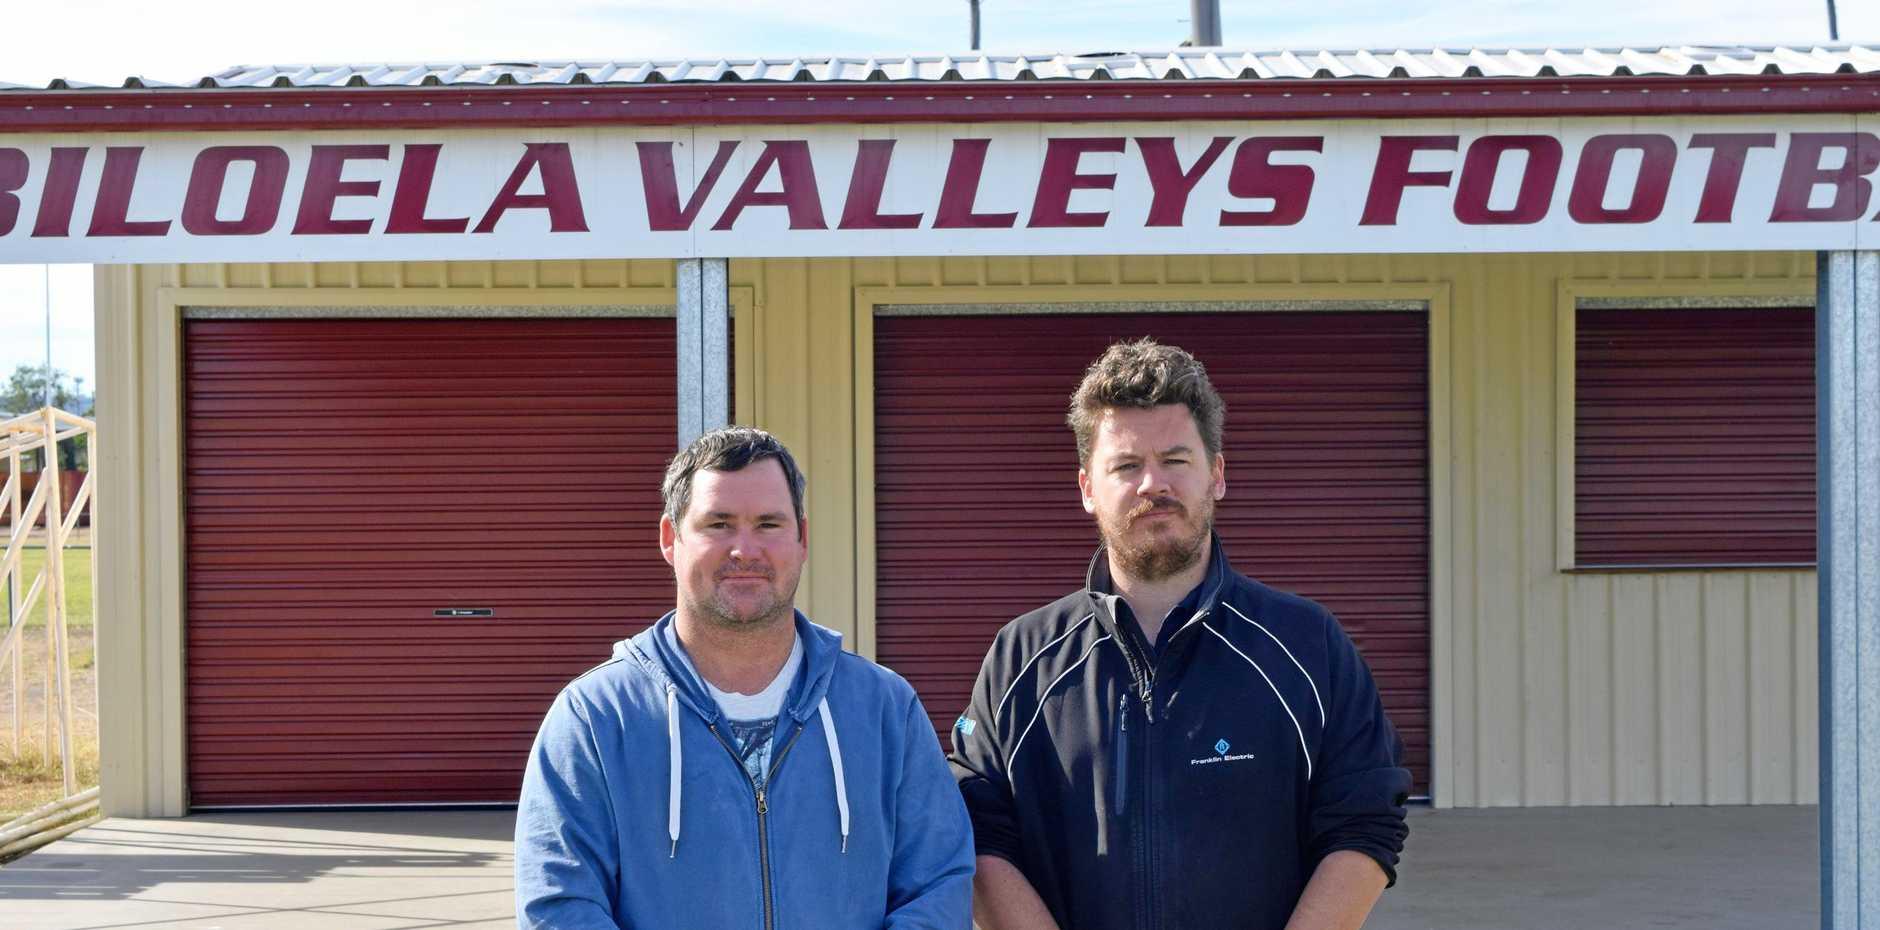 HAD ENOUGH: Biloela Valleys FC president Bradley Smith and vice president Joshua Harlick have had enough of vandals targeting sporting clubs in Biloela.